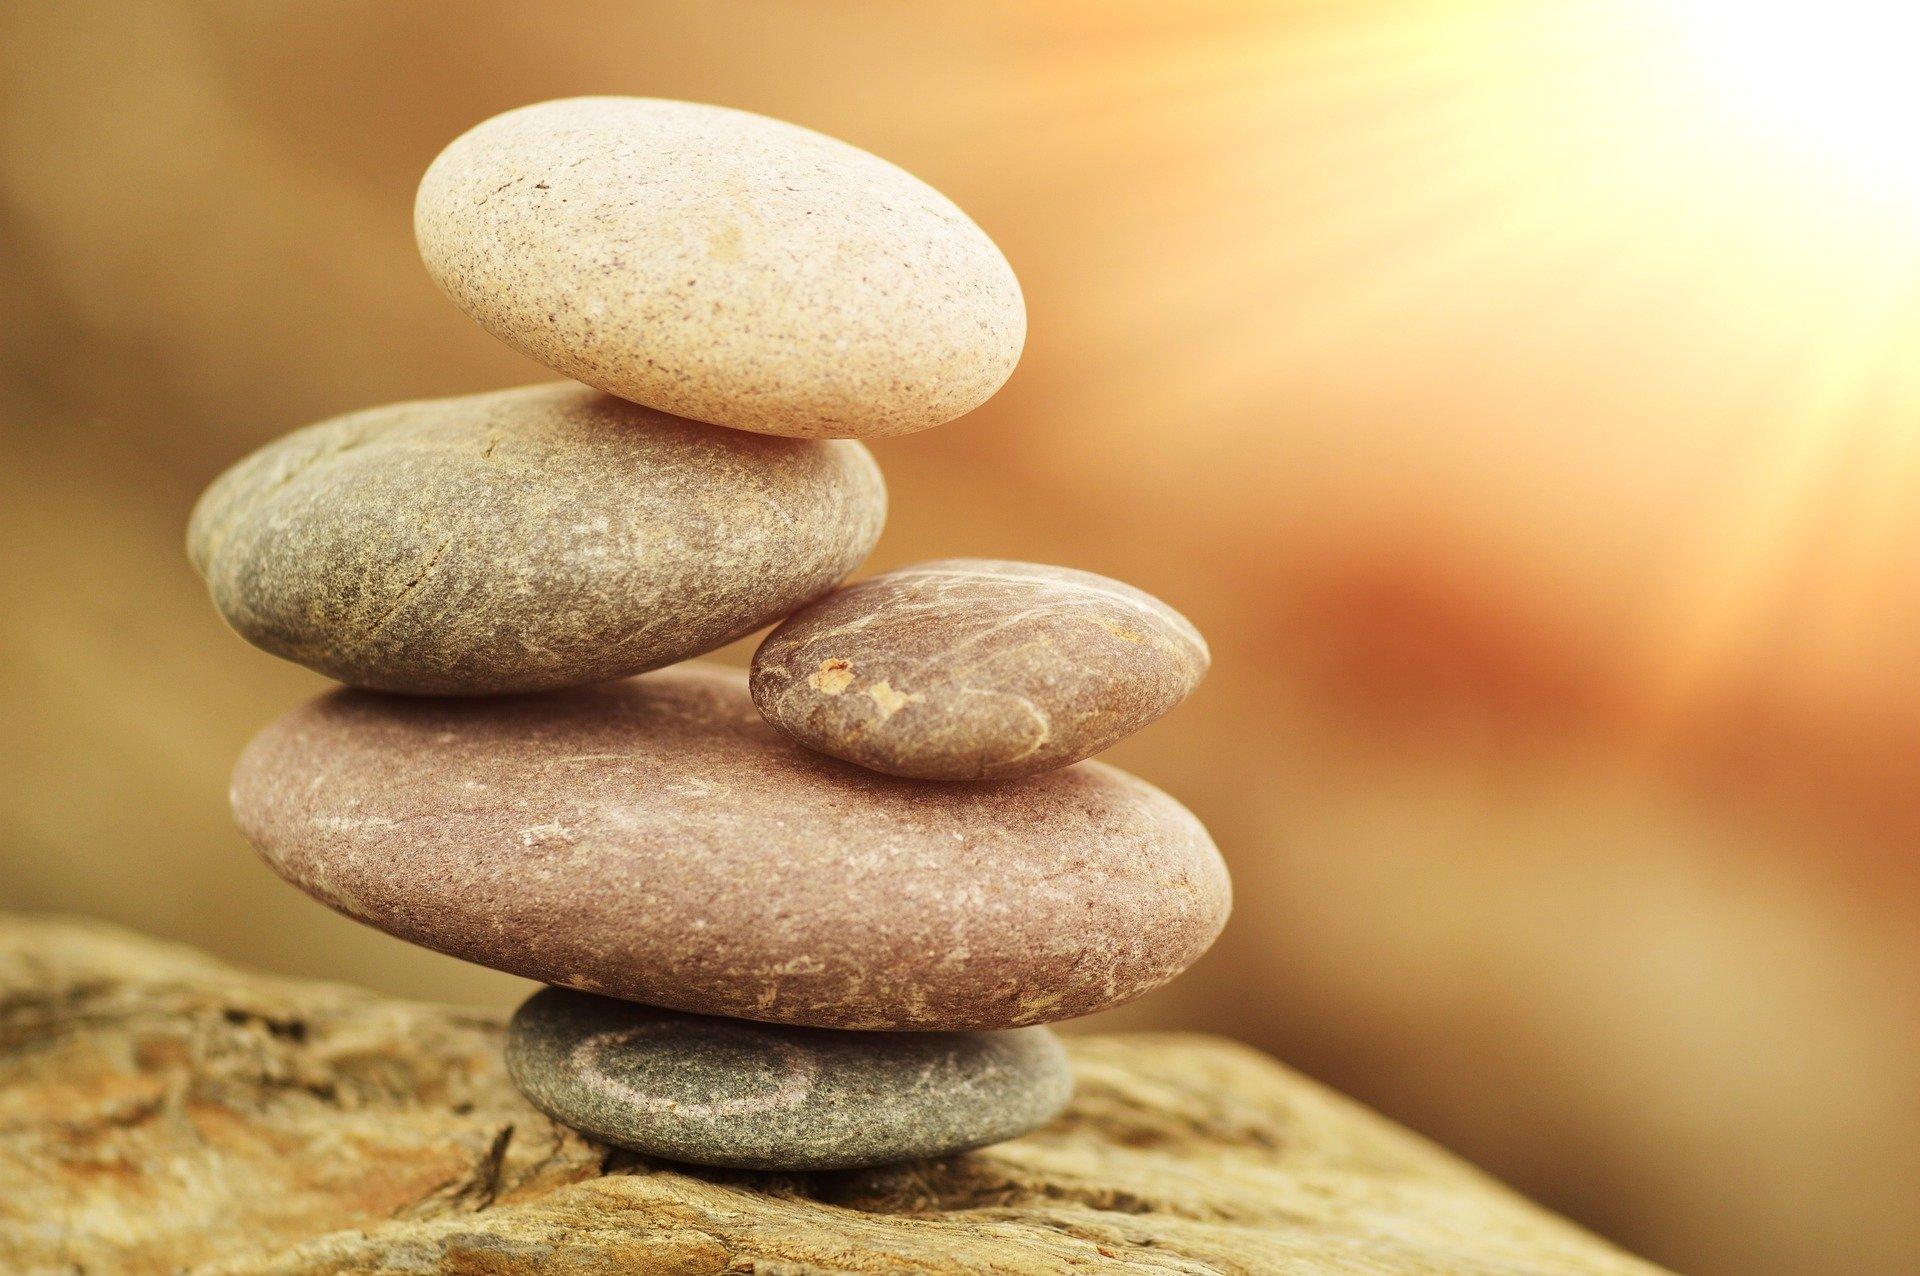 Stack Of Zen Stones Fondo De Pantalla Hd Fondo De